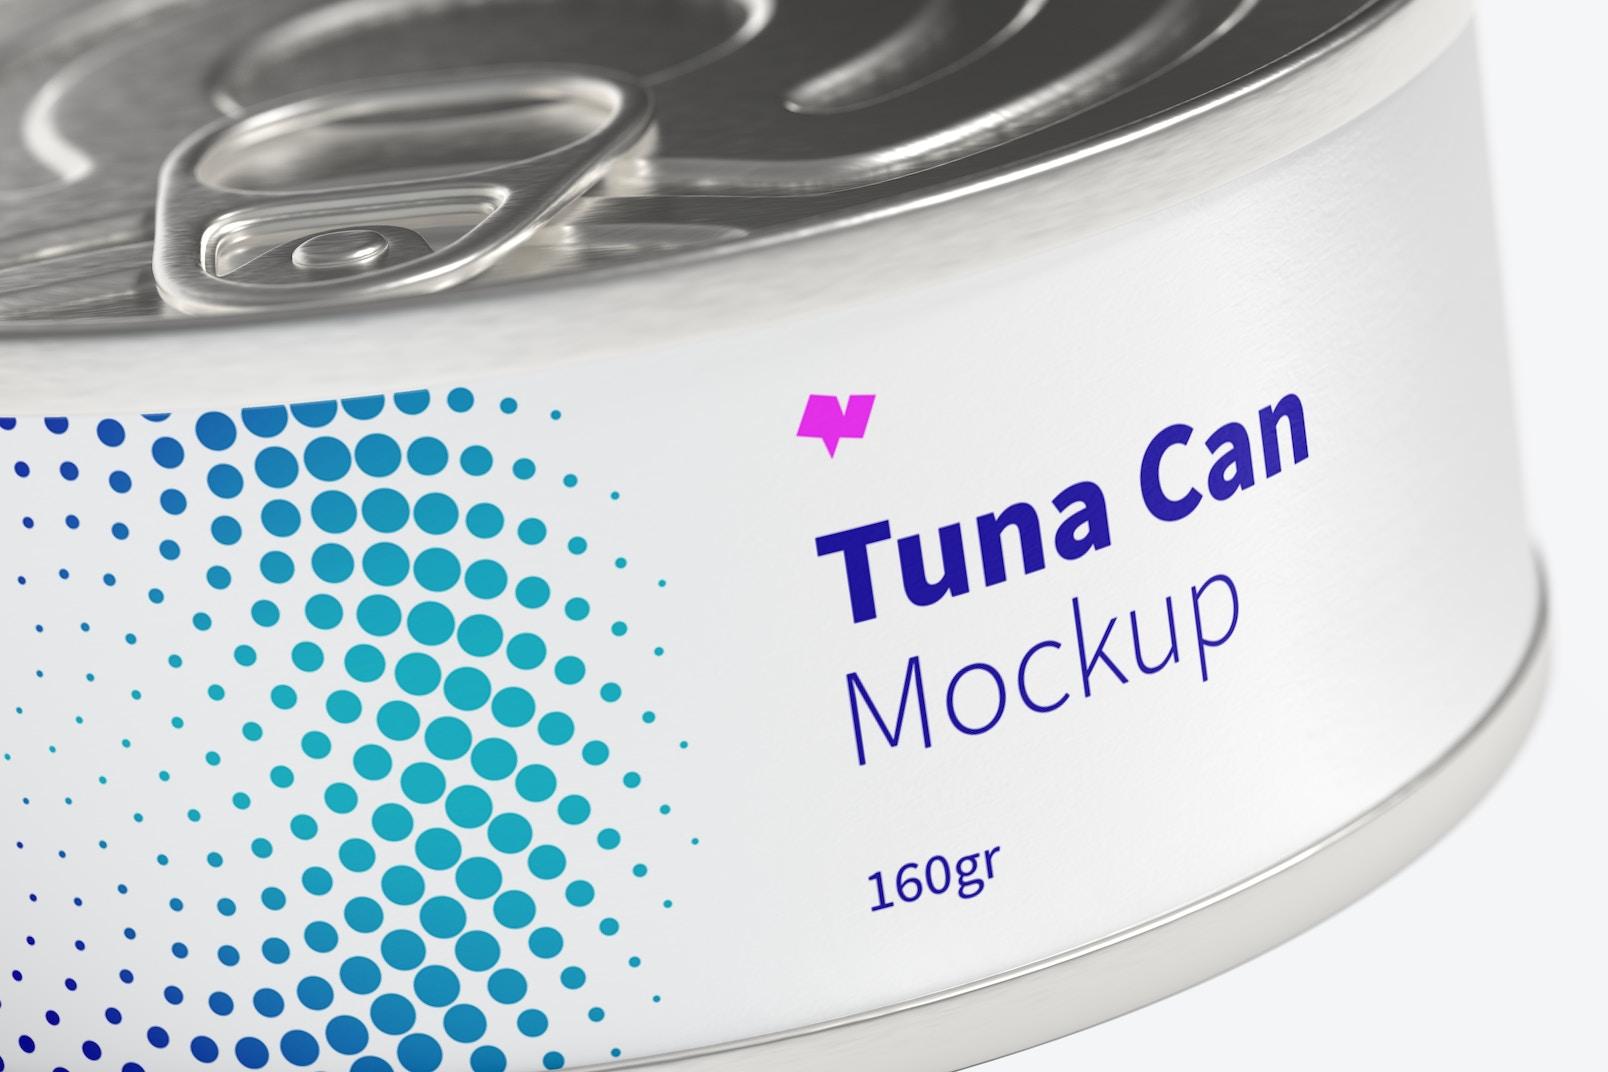 160gr Tuna Can Mockup, Close Up